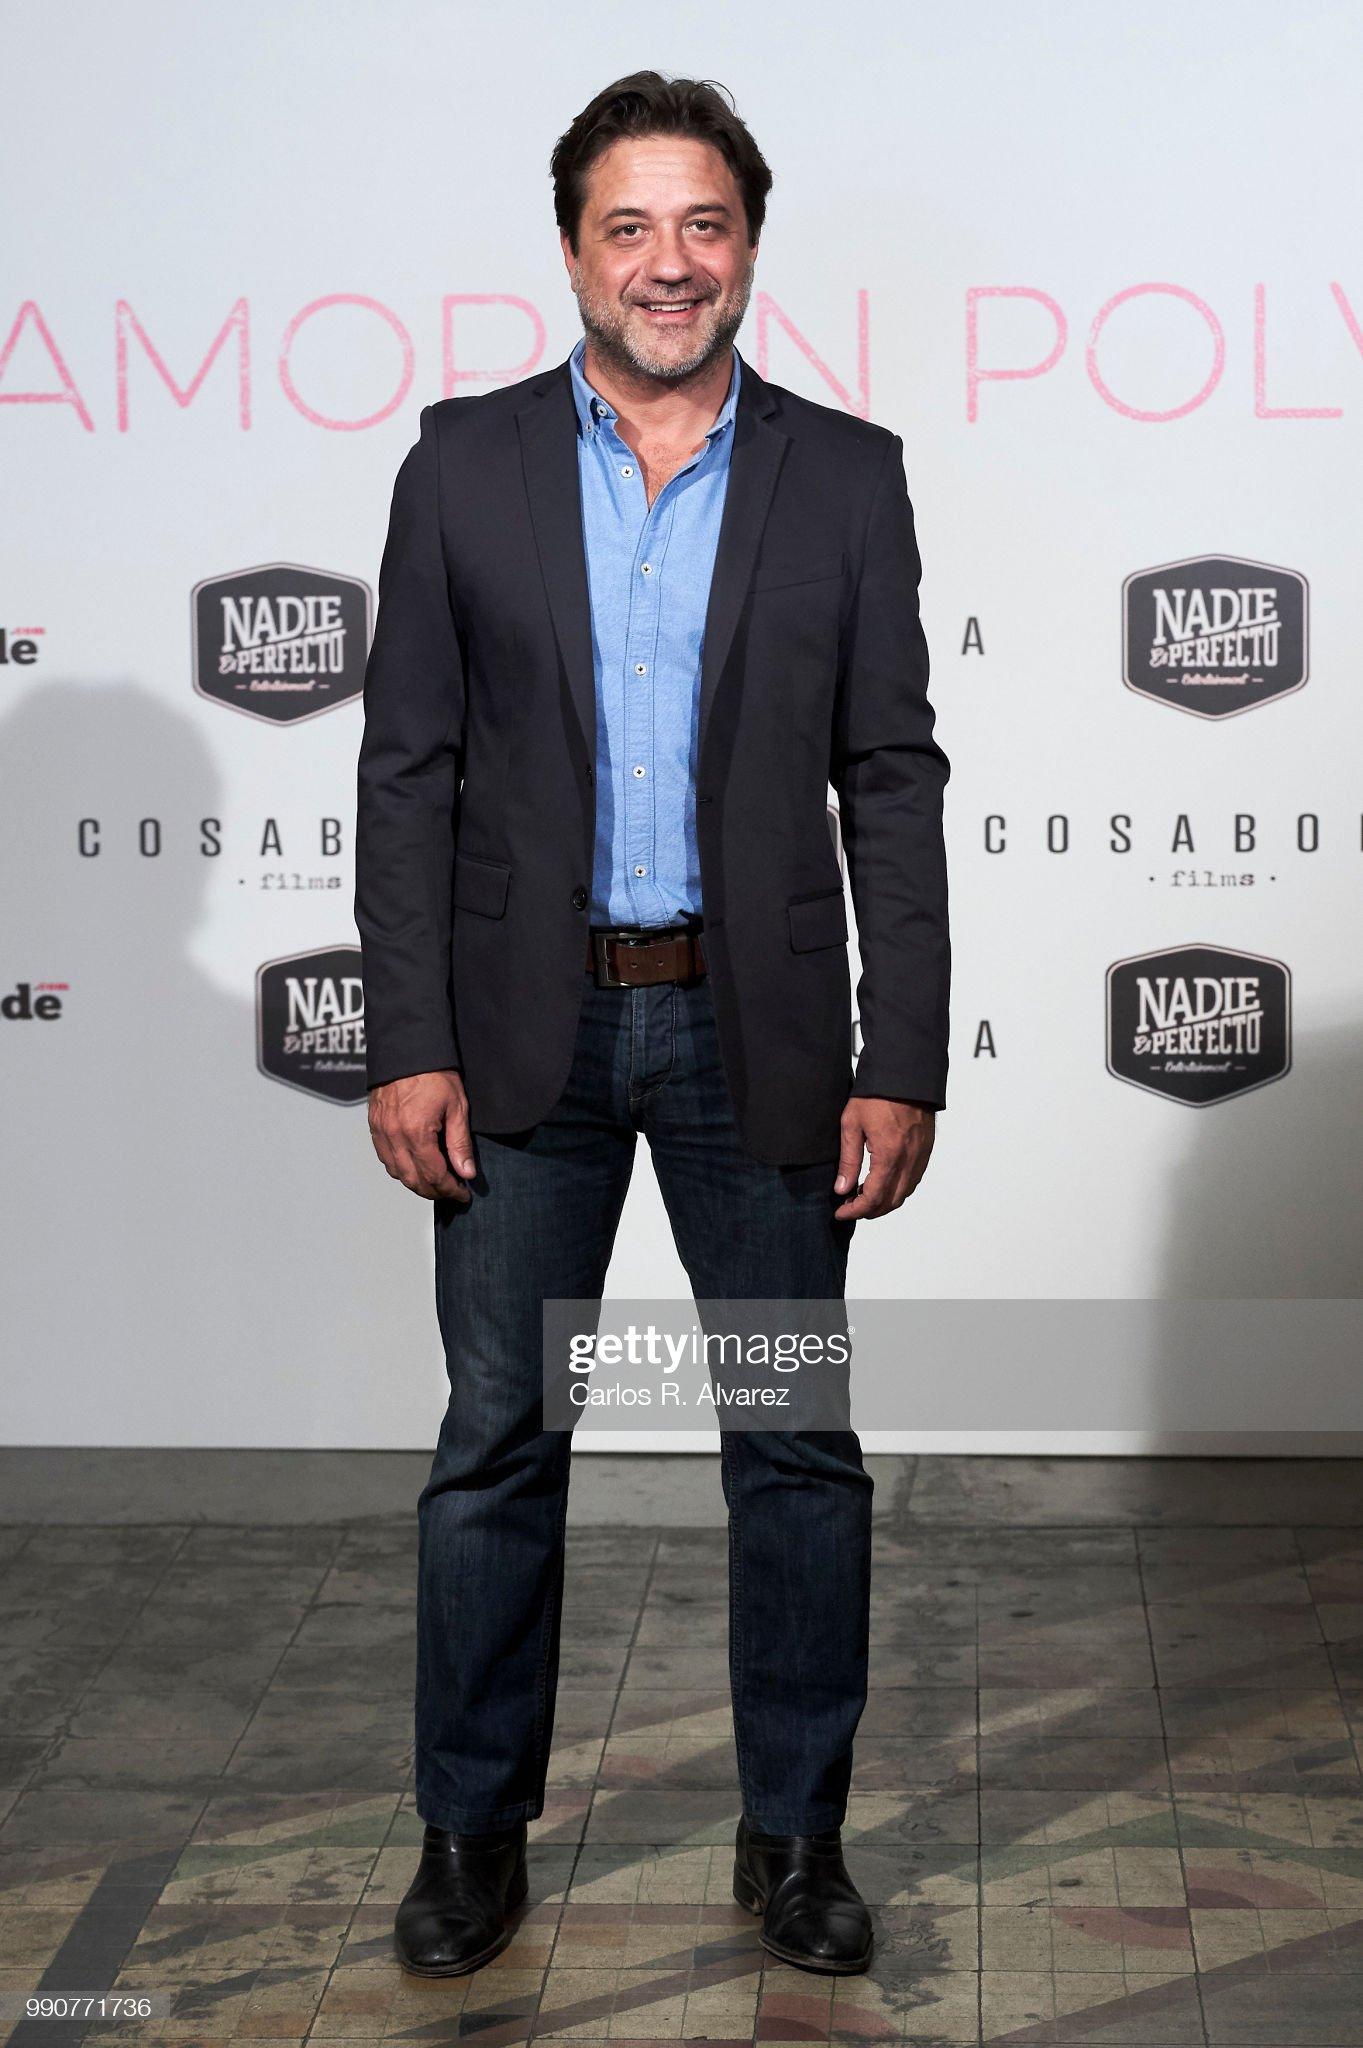 ¿Cuánto mide Enrique Arce? - Altura Actor-enrique-arce-attends-amor-en-polvo-photocall-at-the-sala-equis-picture-id990771736?s=2048x2048